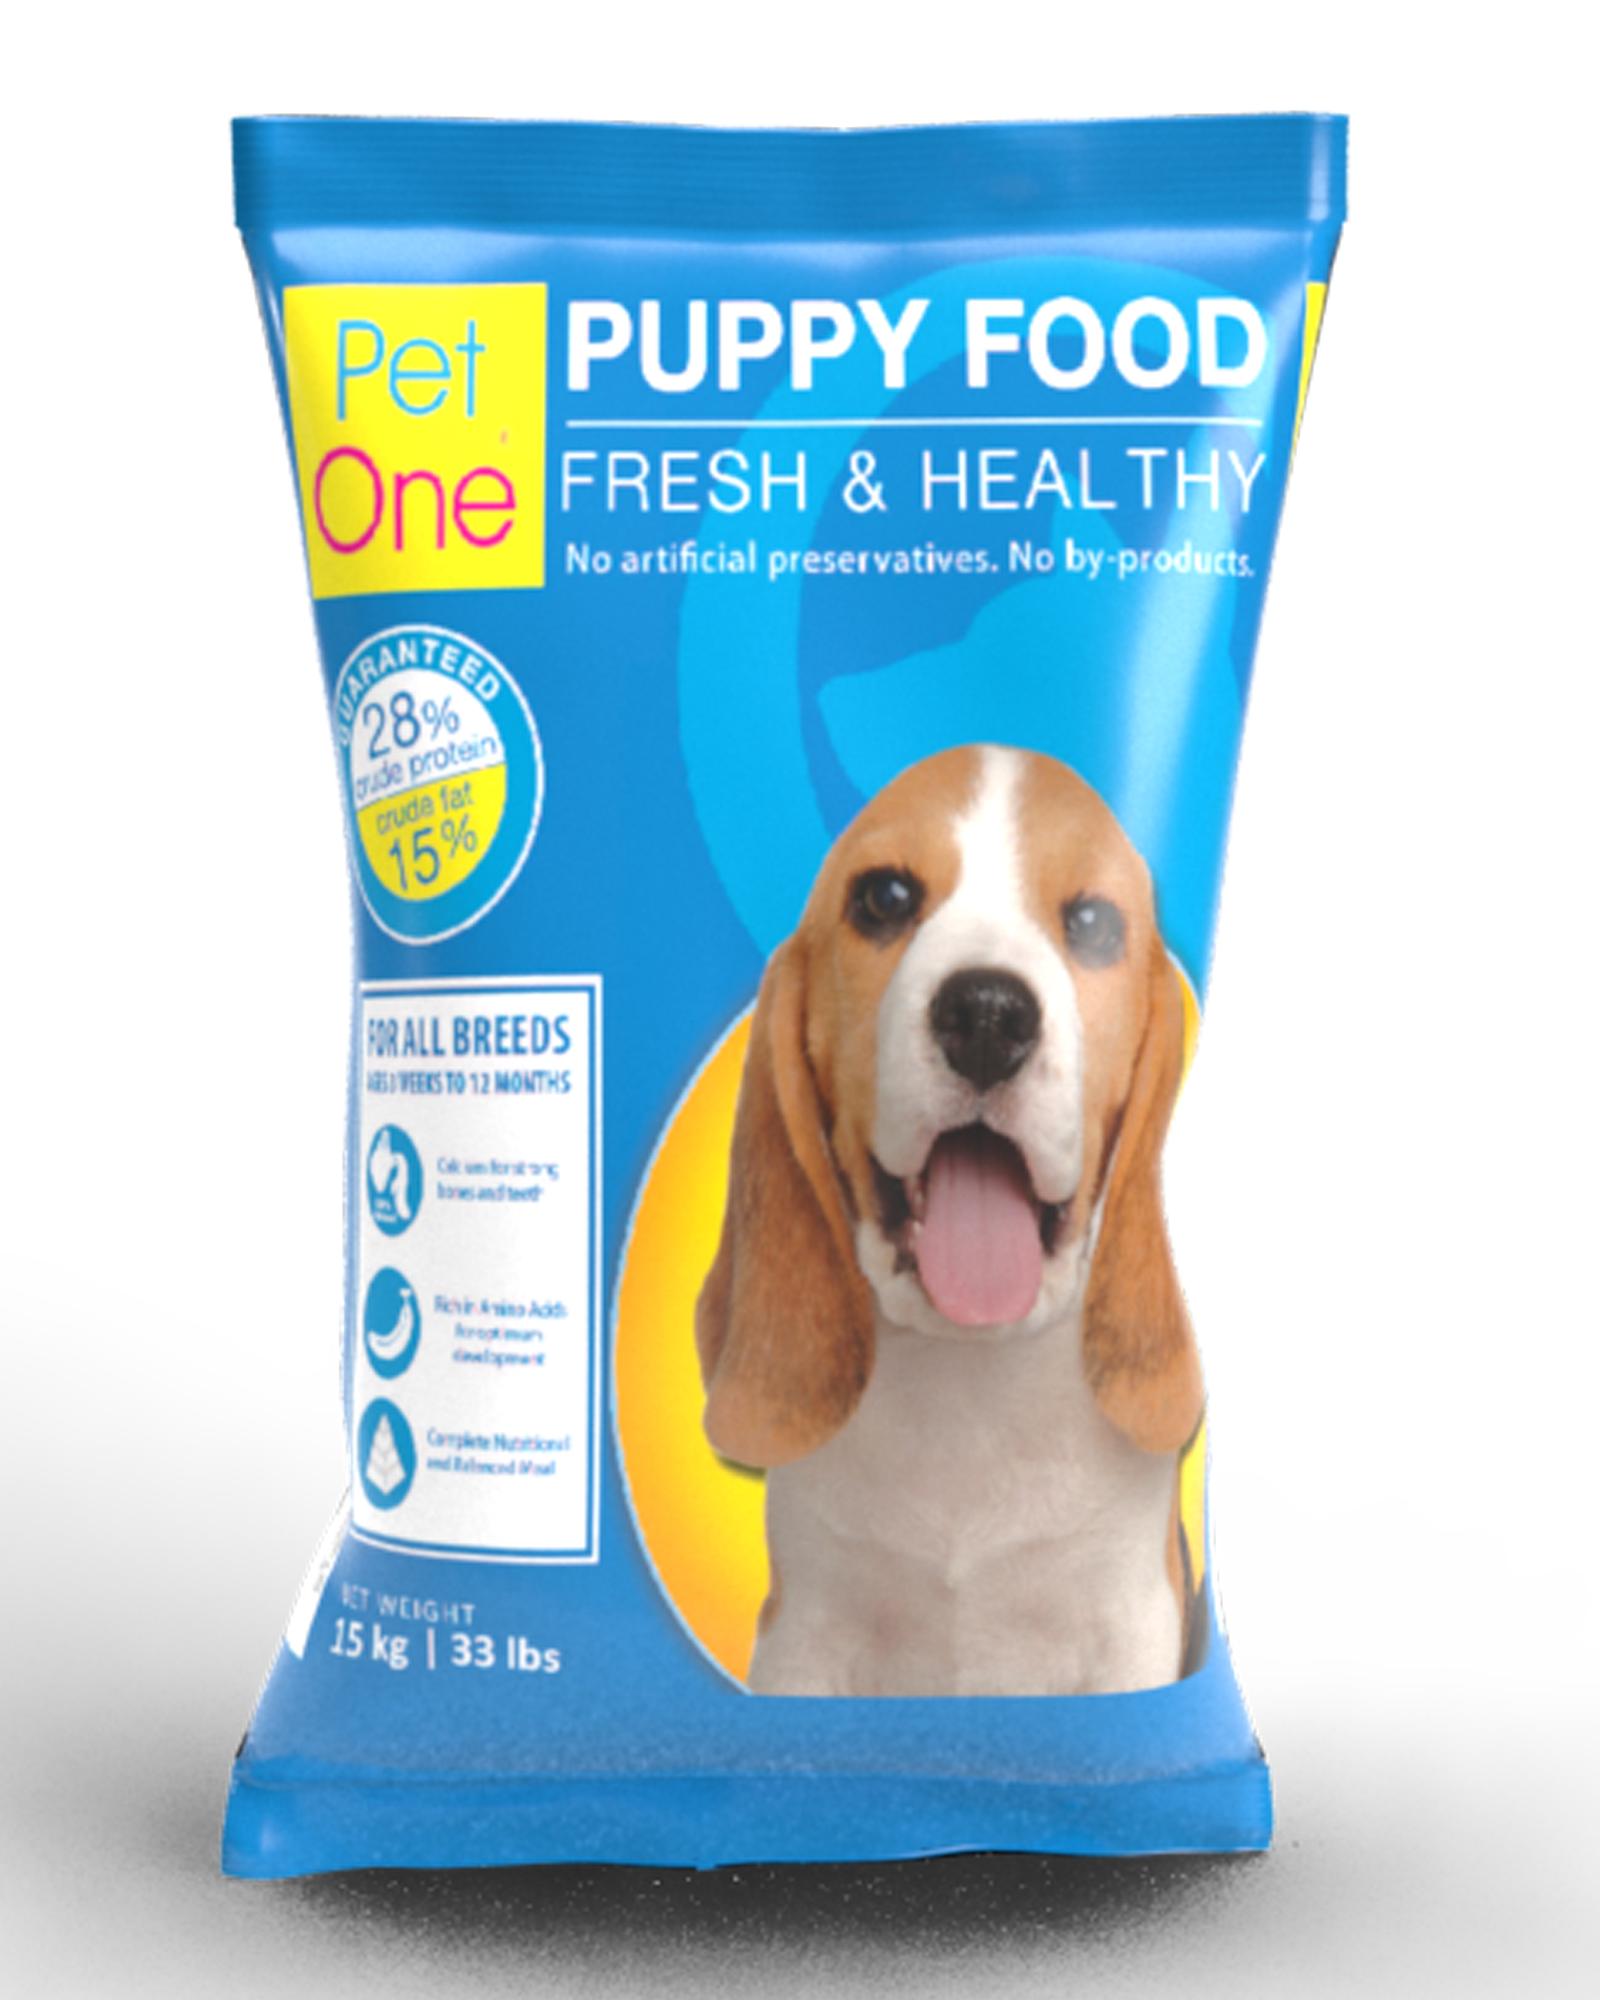 Puppy Food Pet One Pet Food